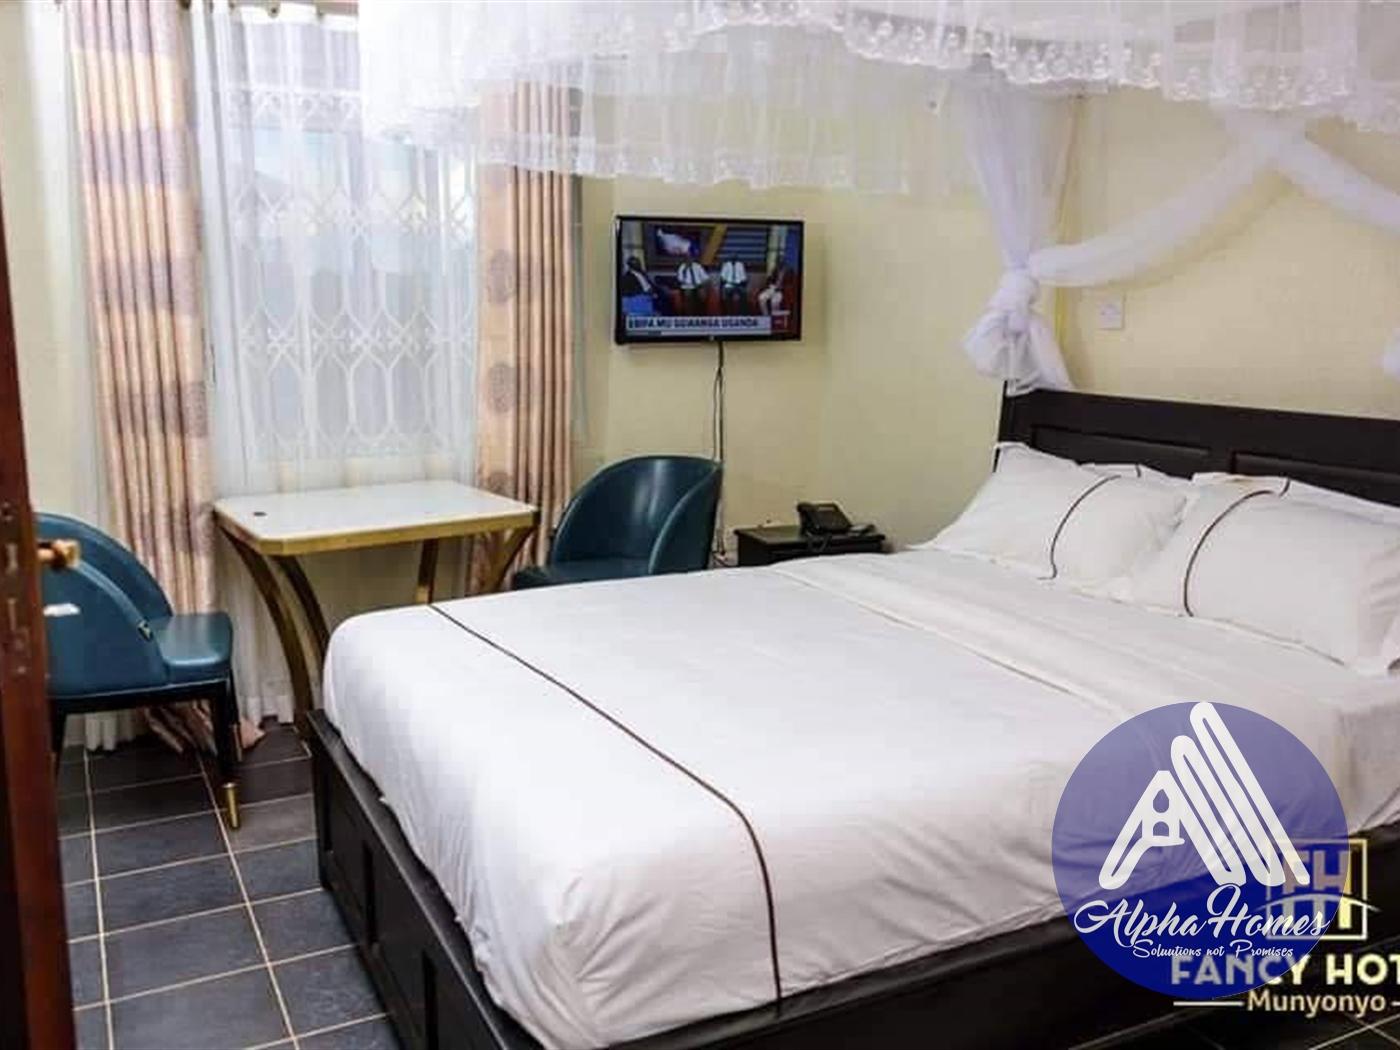 Hotel for sale in Munyonyo Kampala